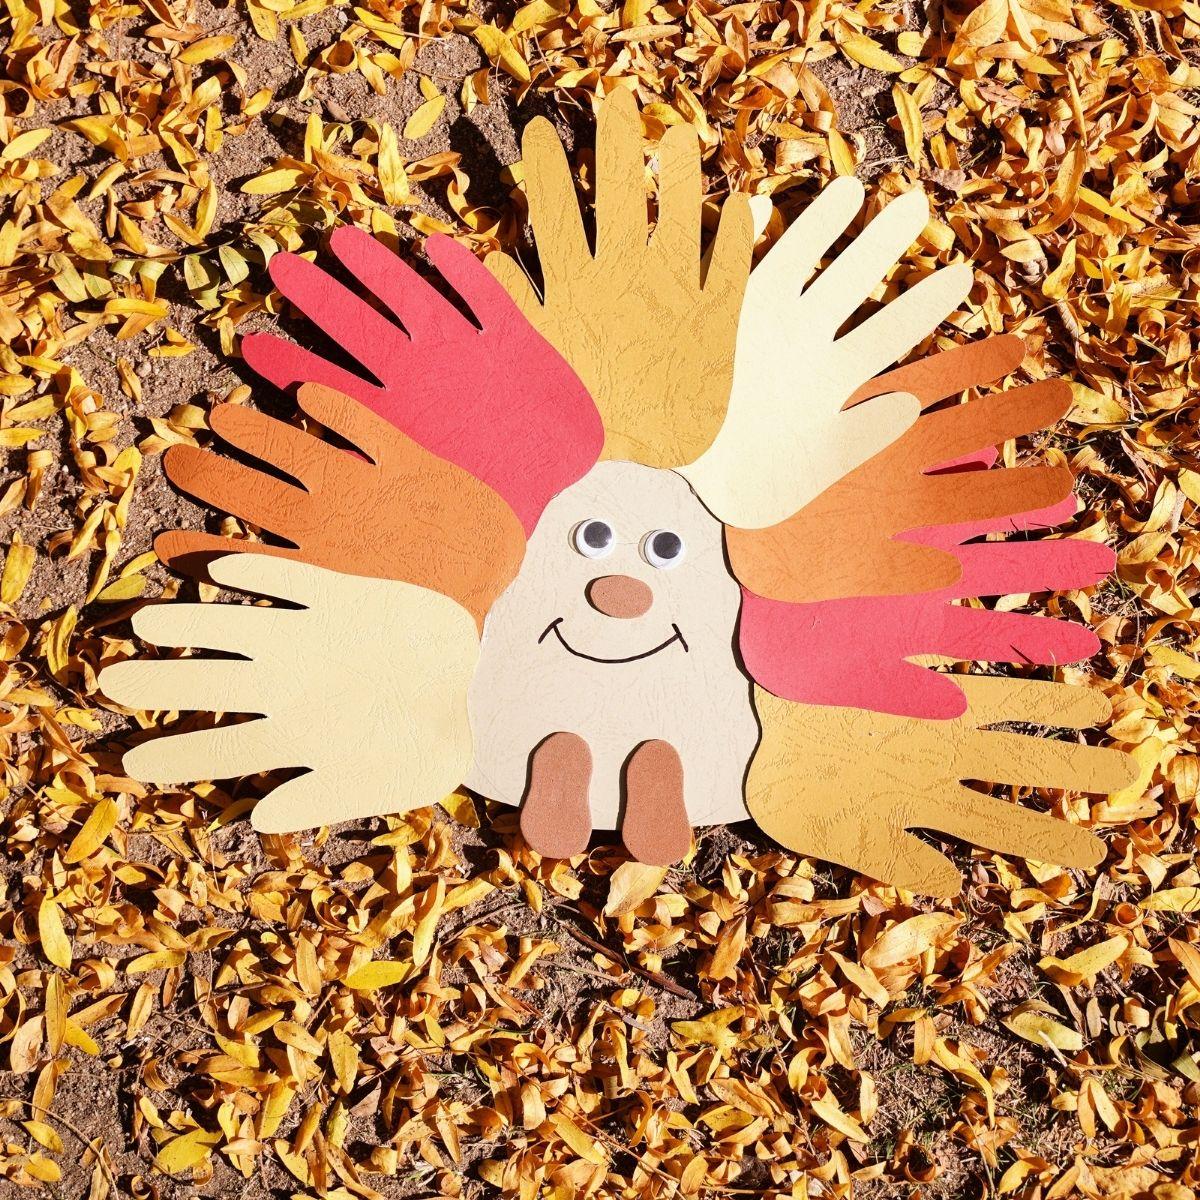 Handprint hedgehog laying on fallen leaves